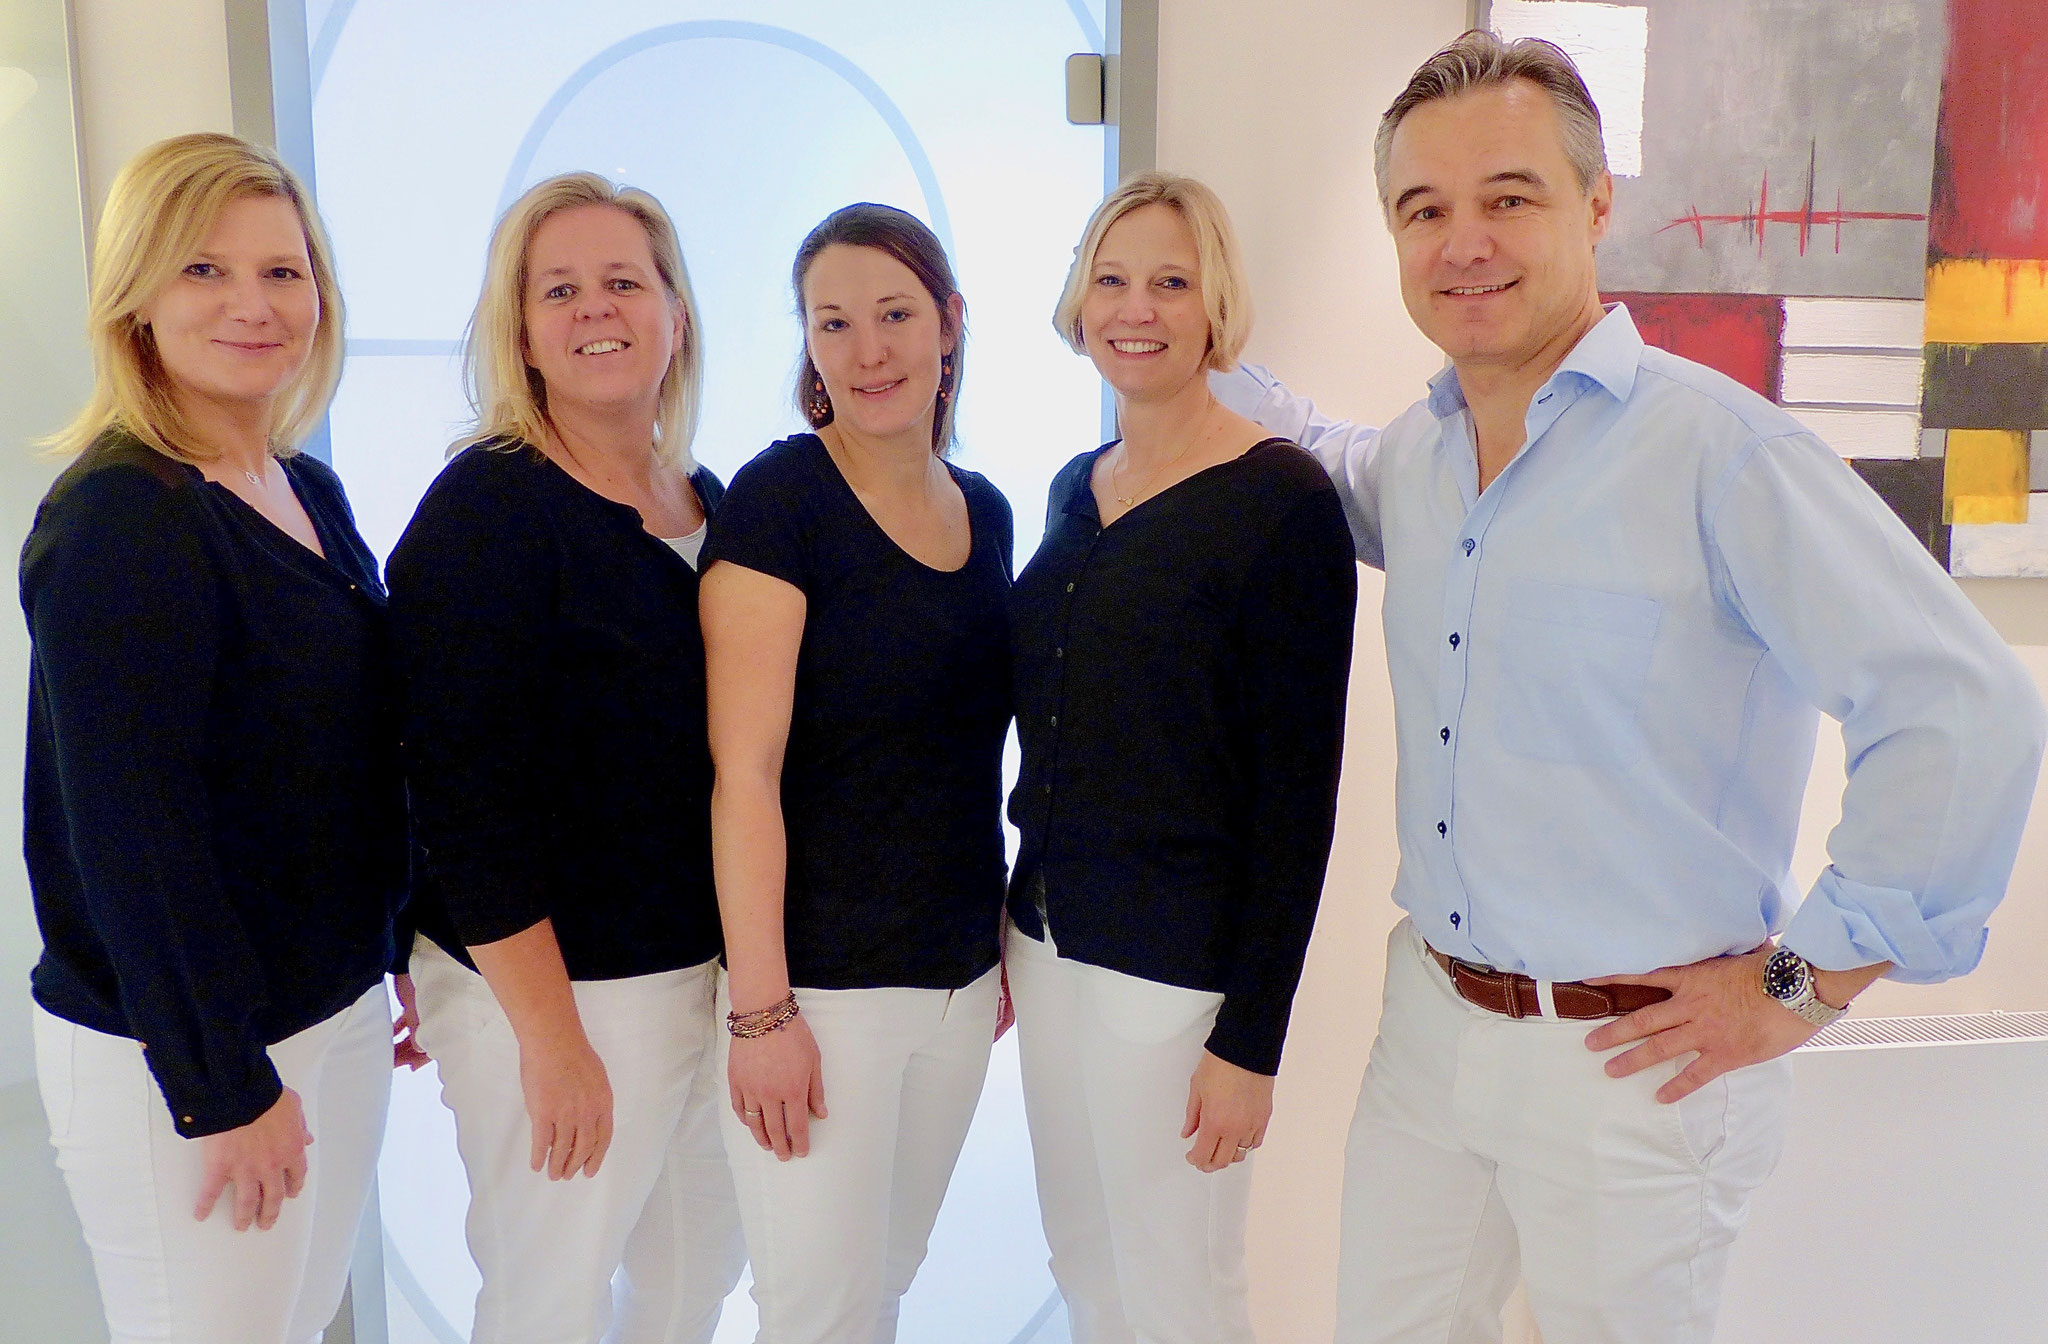 Das Team: Daniela W., Cathrin K., Nora G., Vivian H. ; Dr. Dirk Hedrich